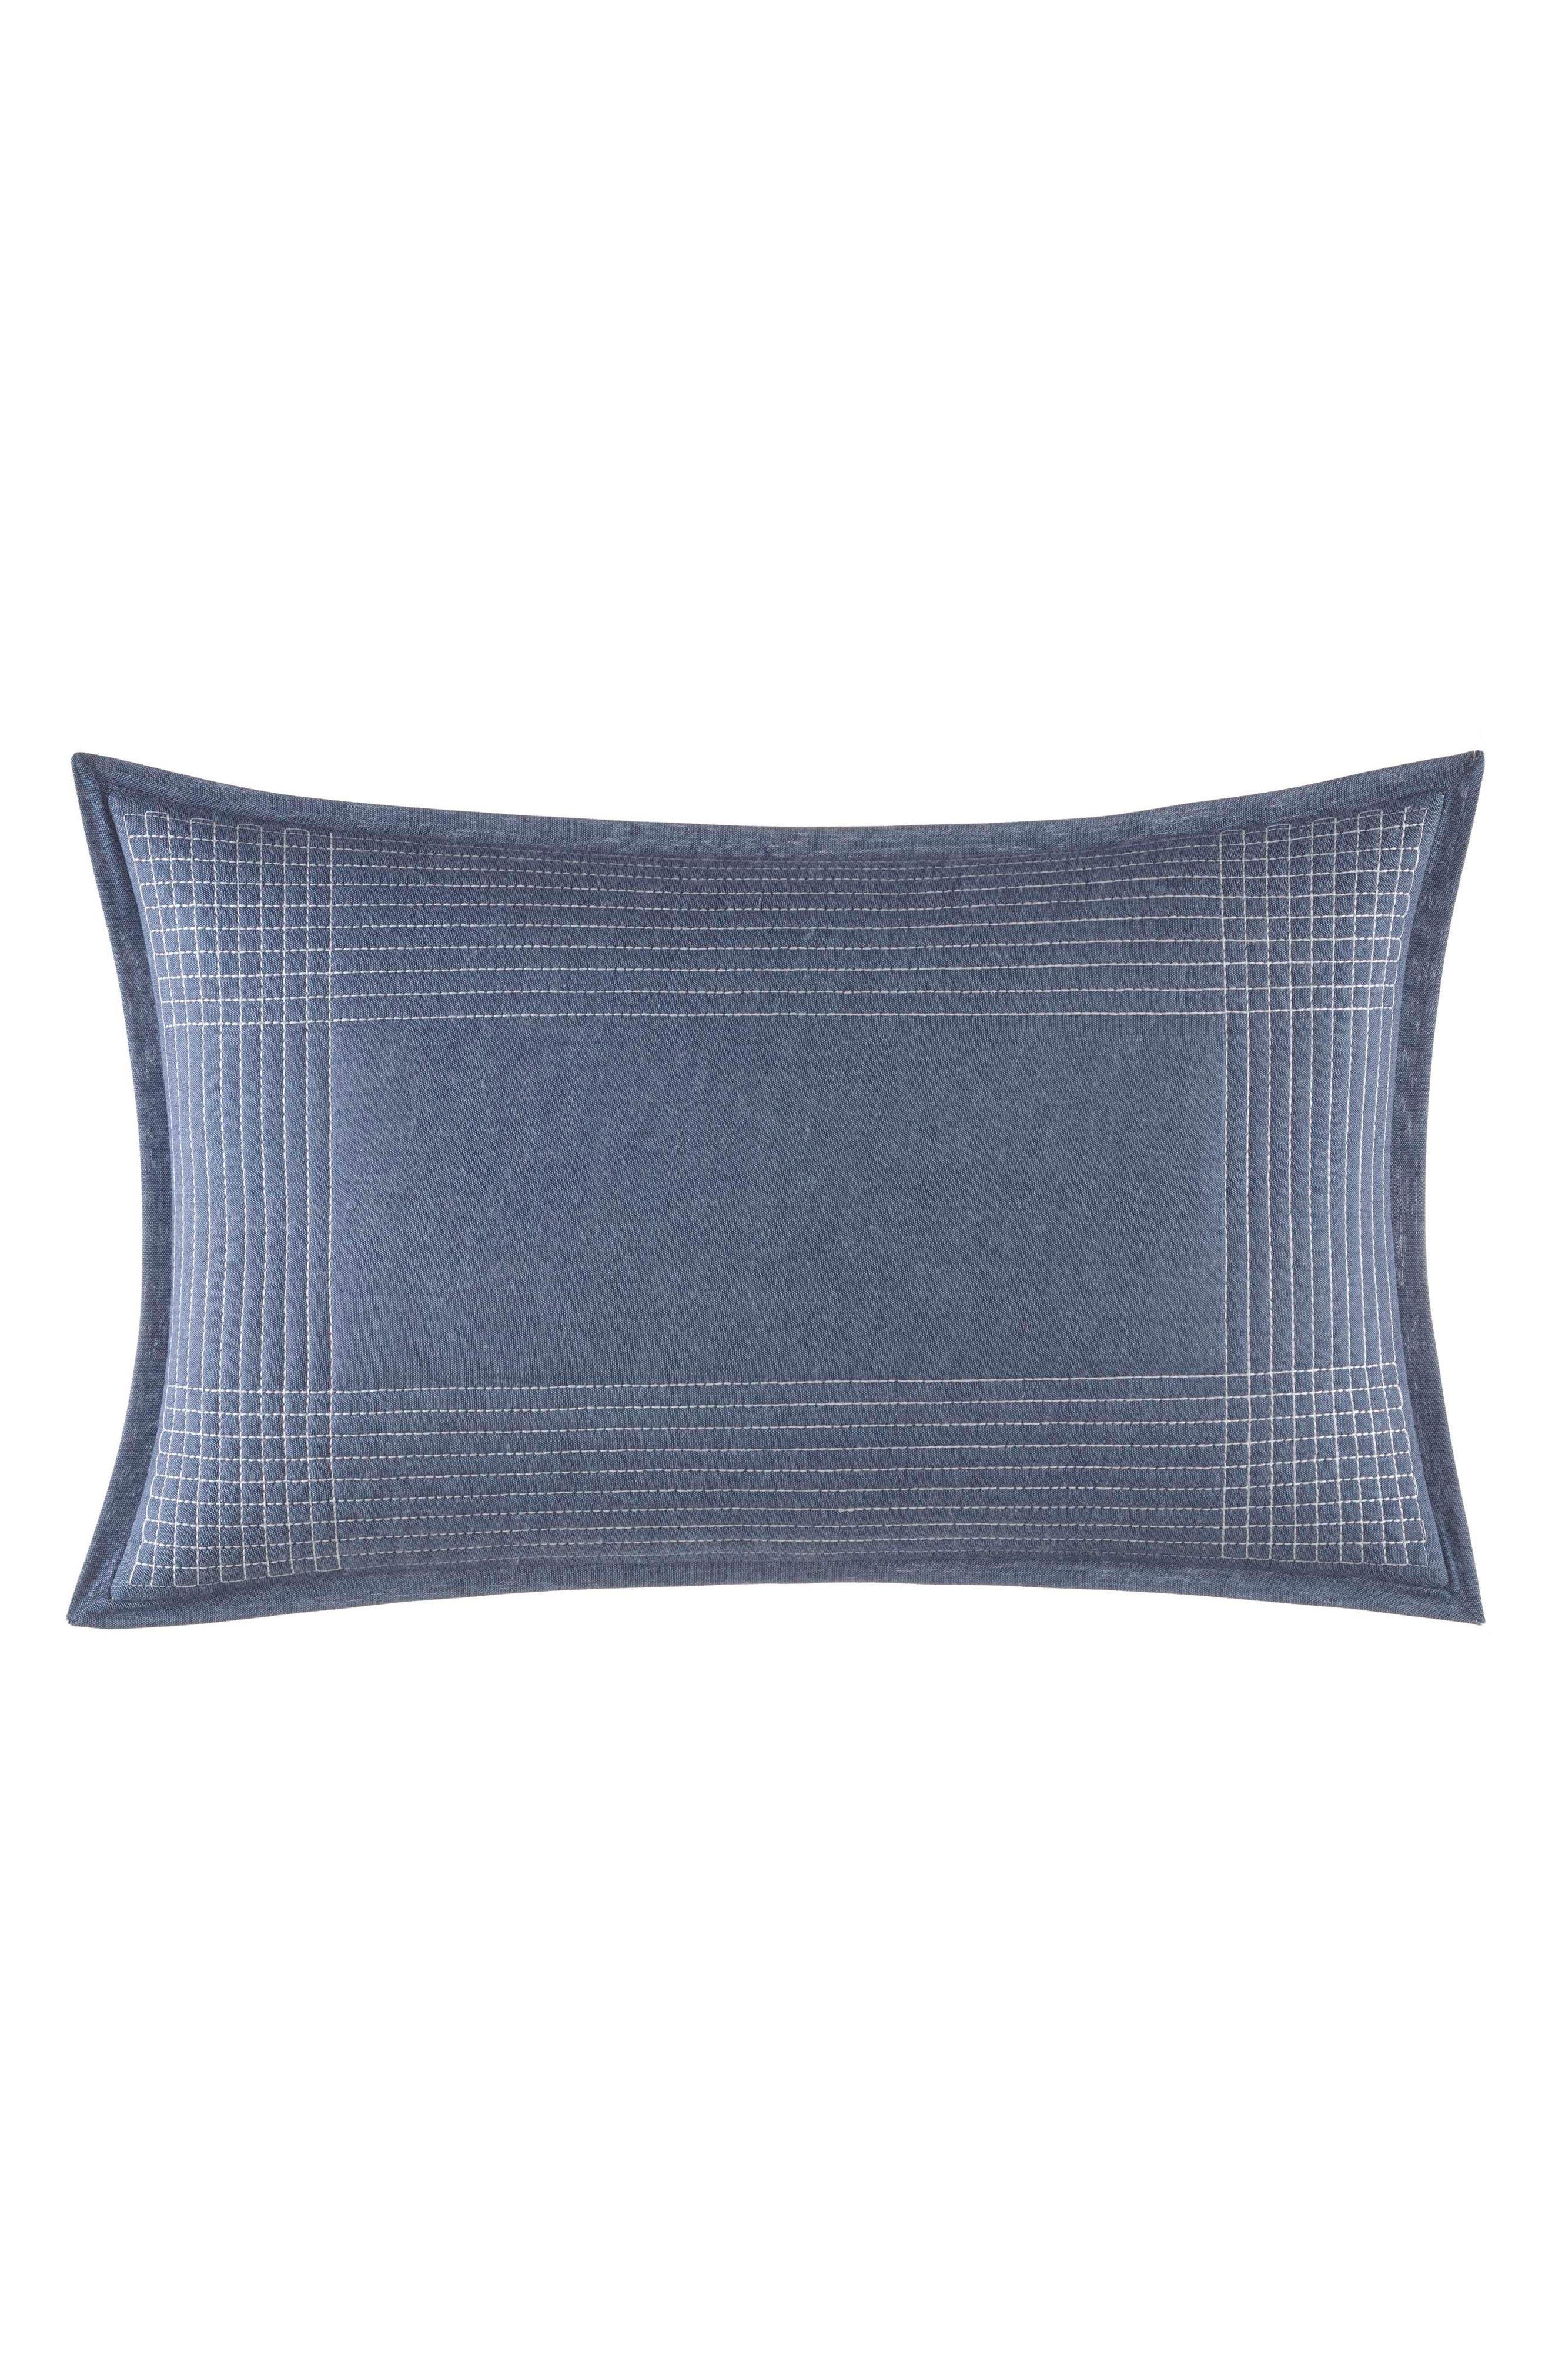 Norwich Stitched Accent Pillow,                         Main,                         color, Medium Blue